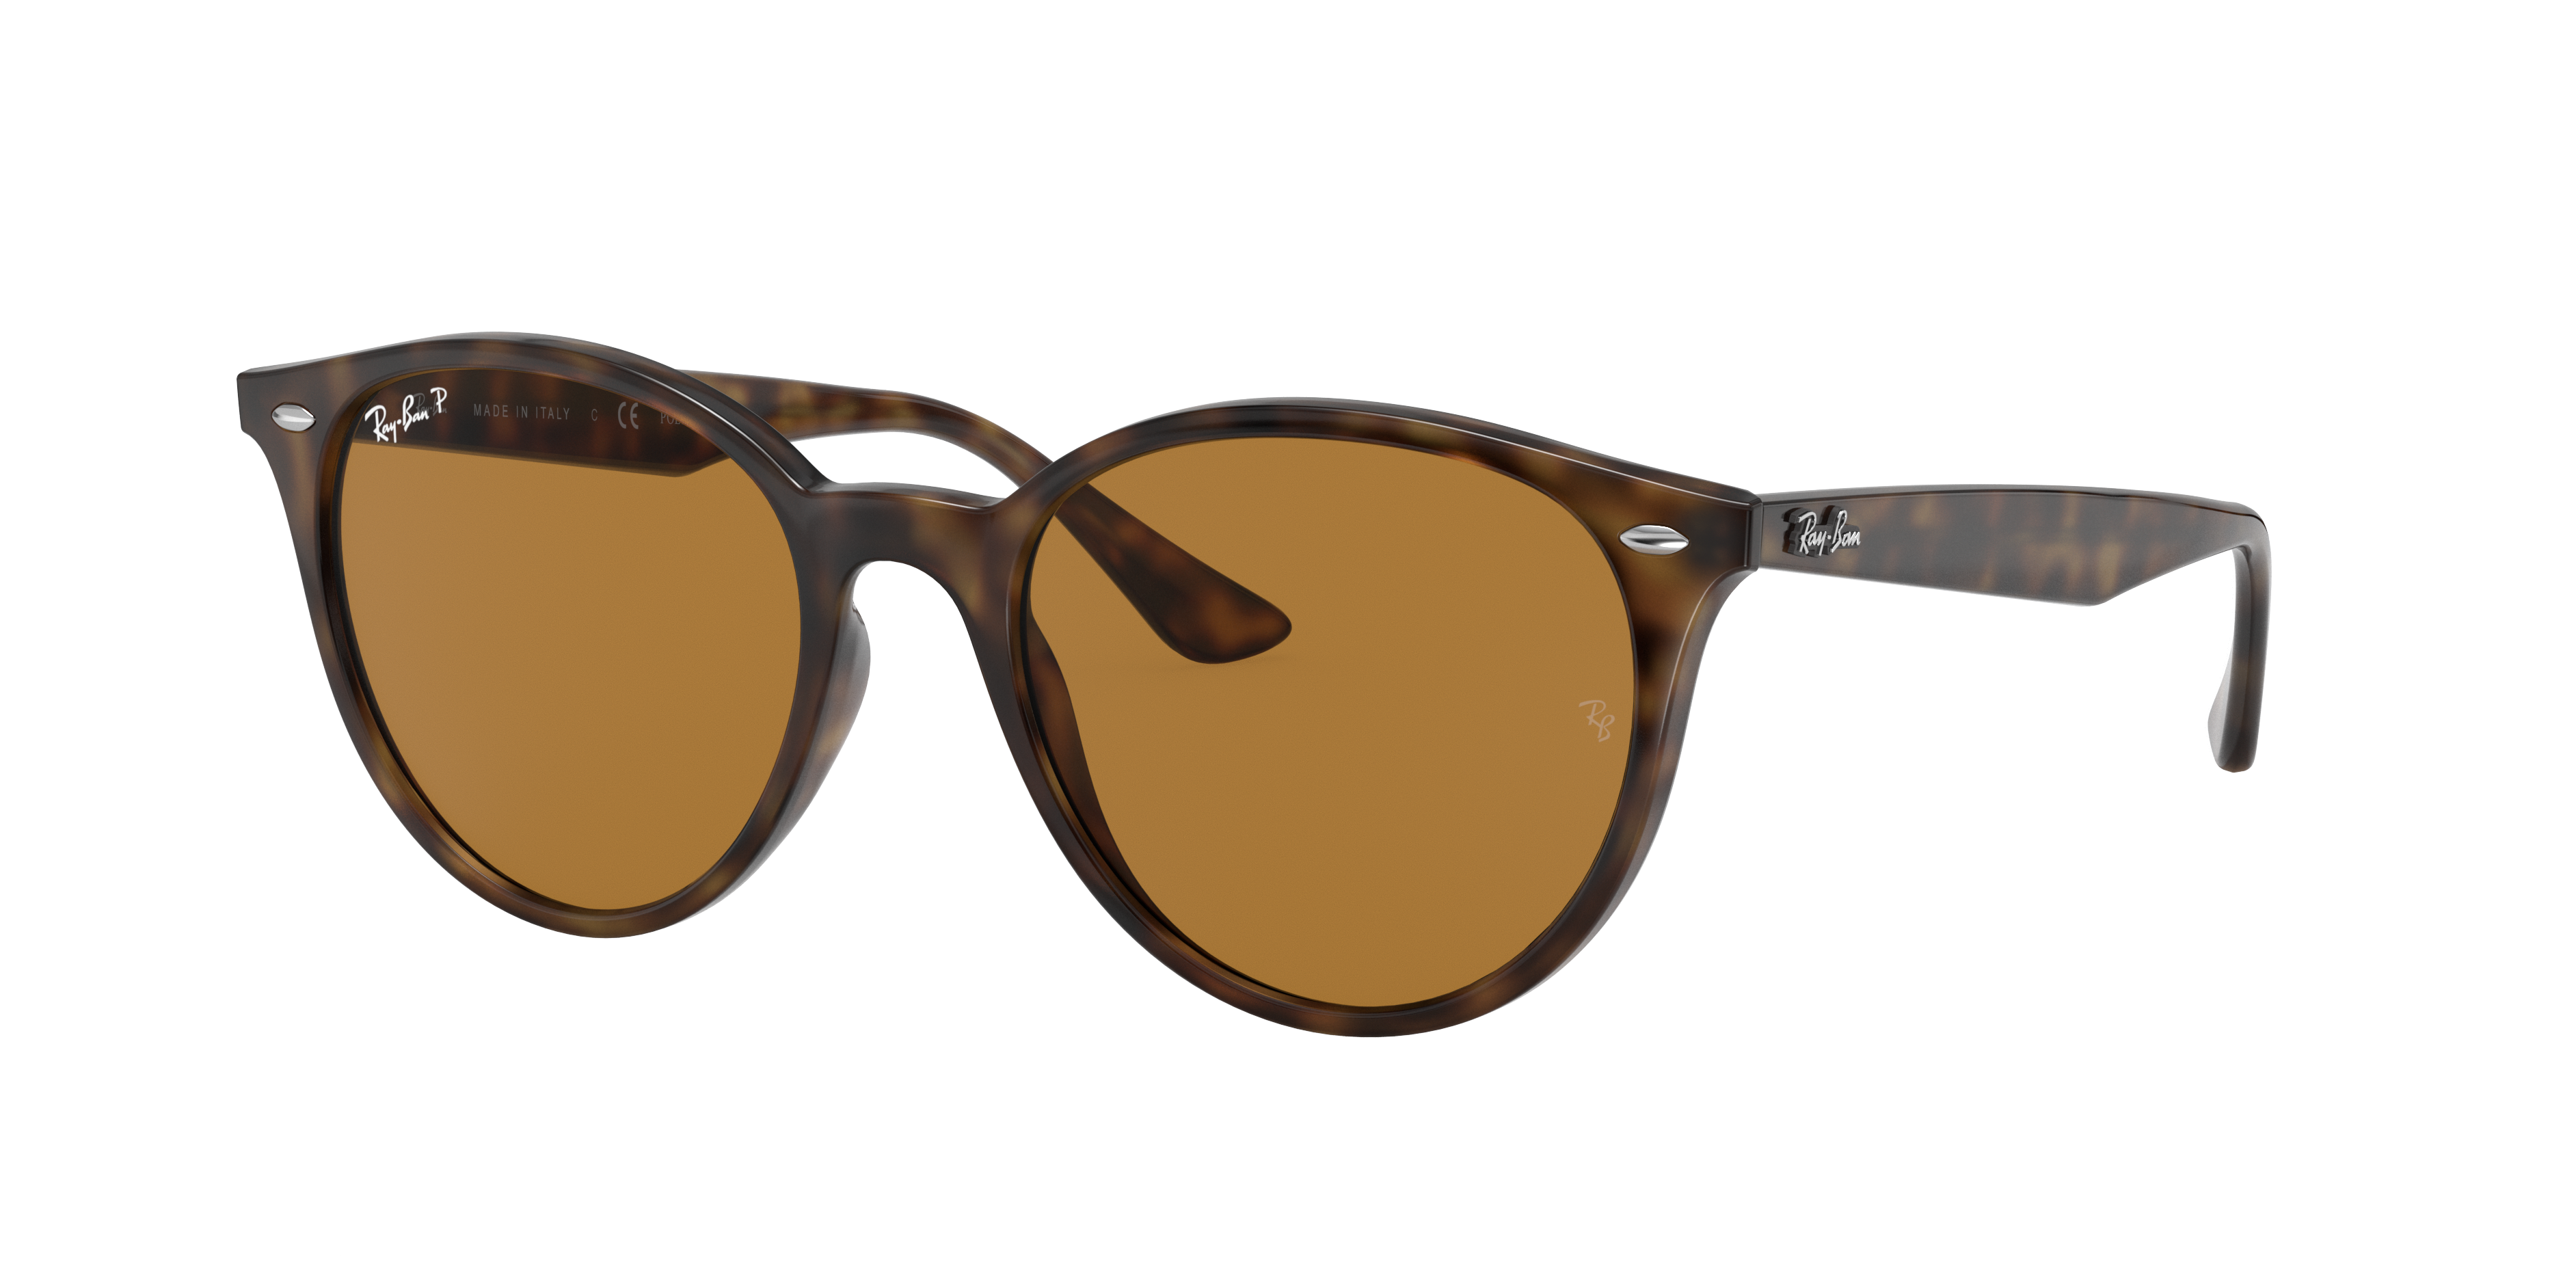 Ray-Ban Rb4305 Tortoise, Polarized Brown Lenses - RB4305